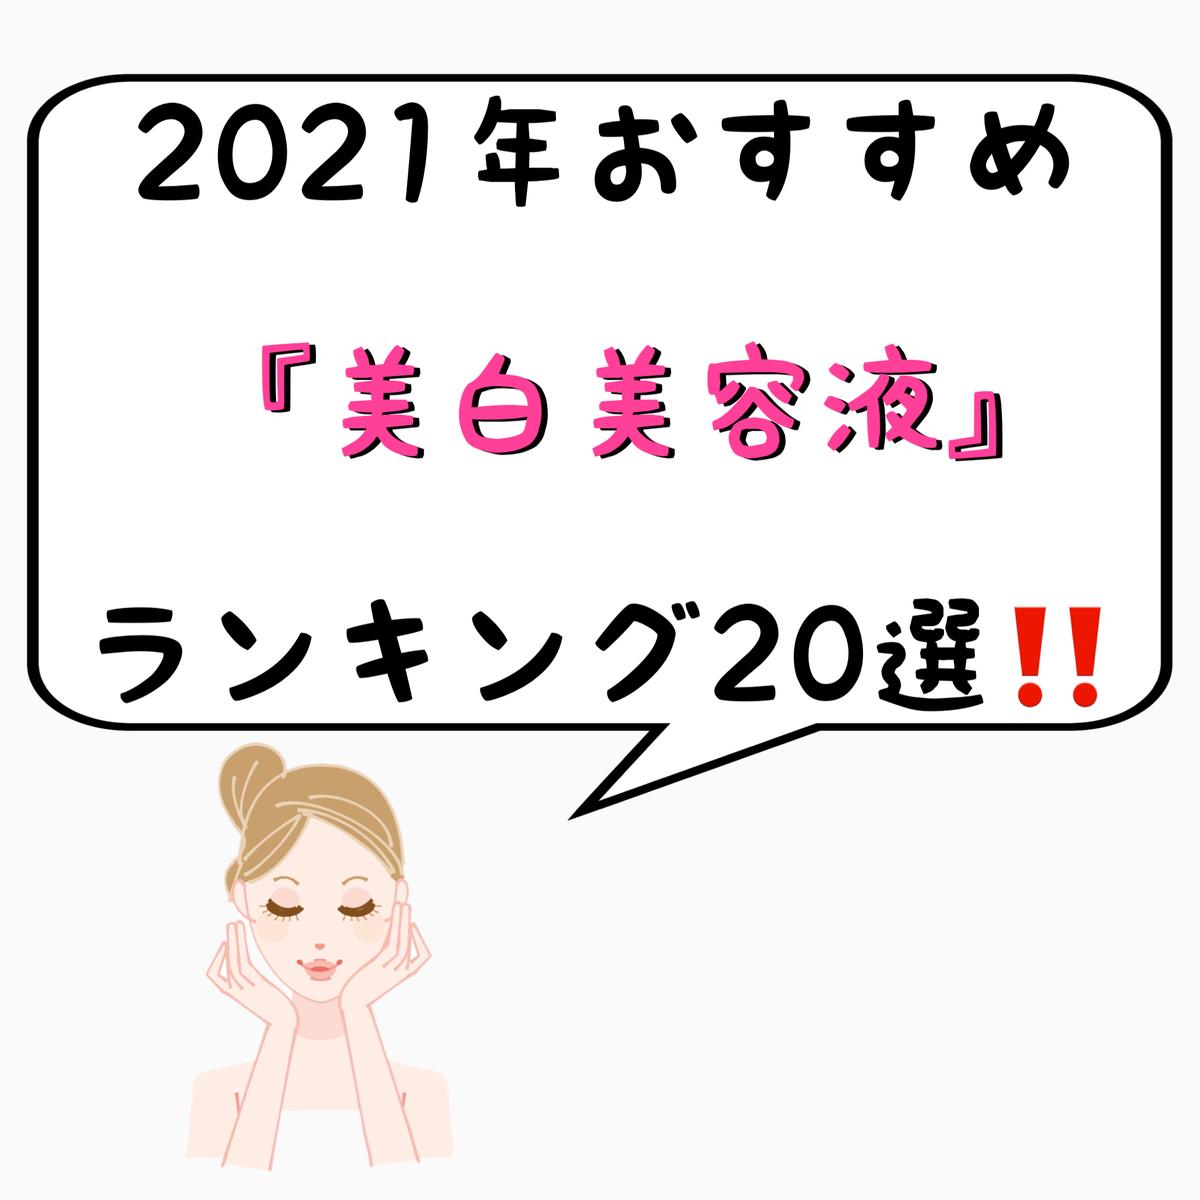 f:id:nokonoko_o:20210122120414j:plain